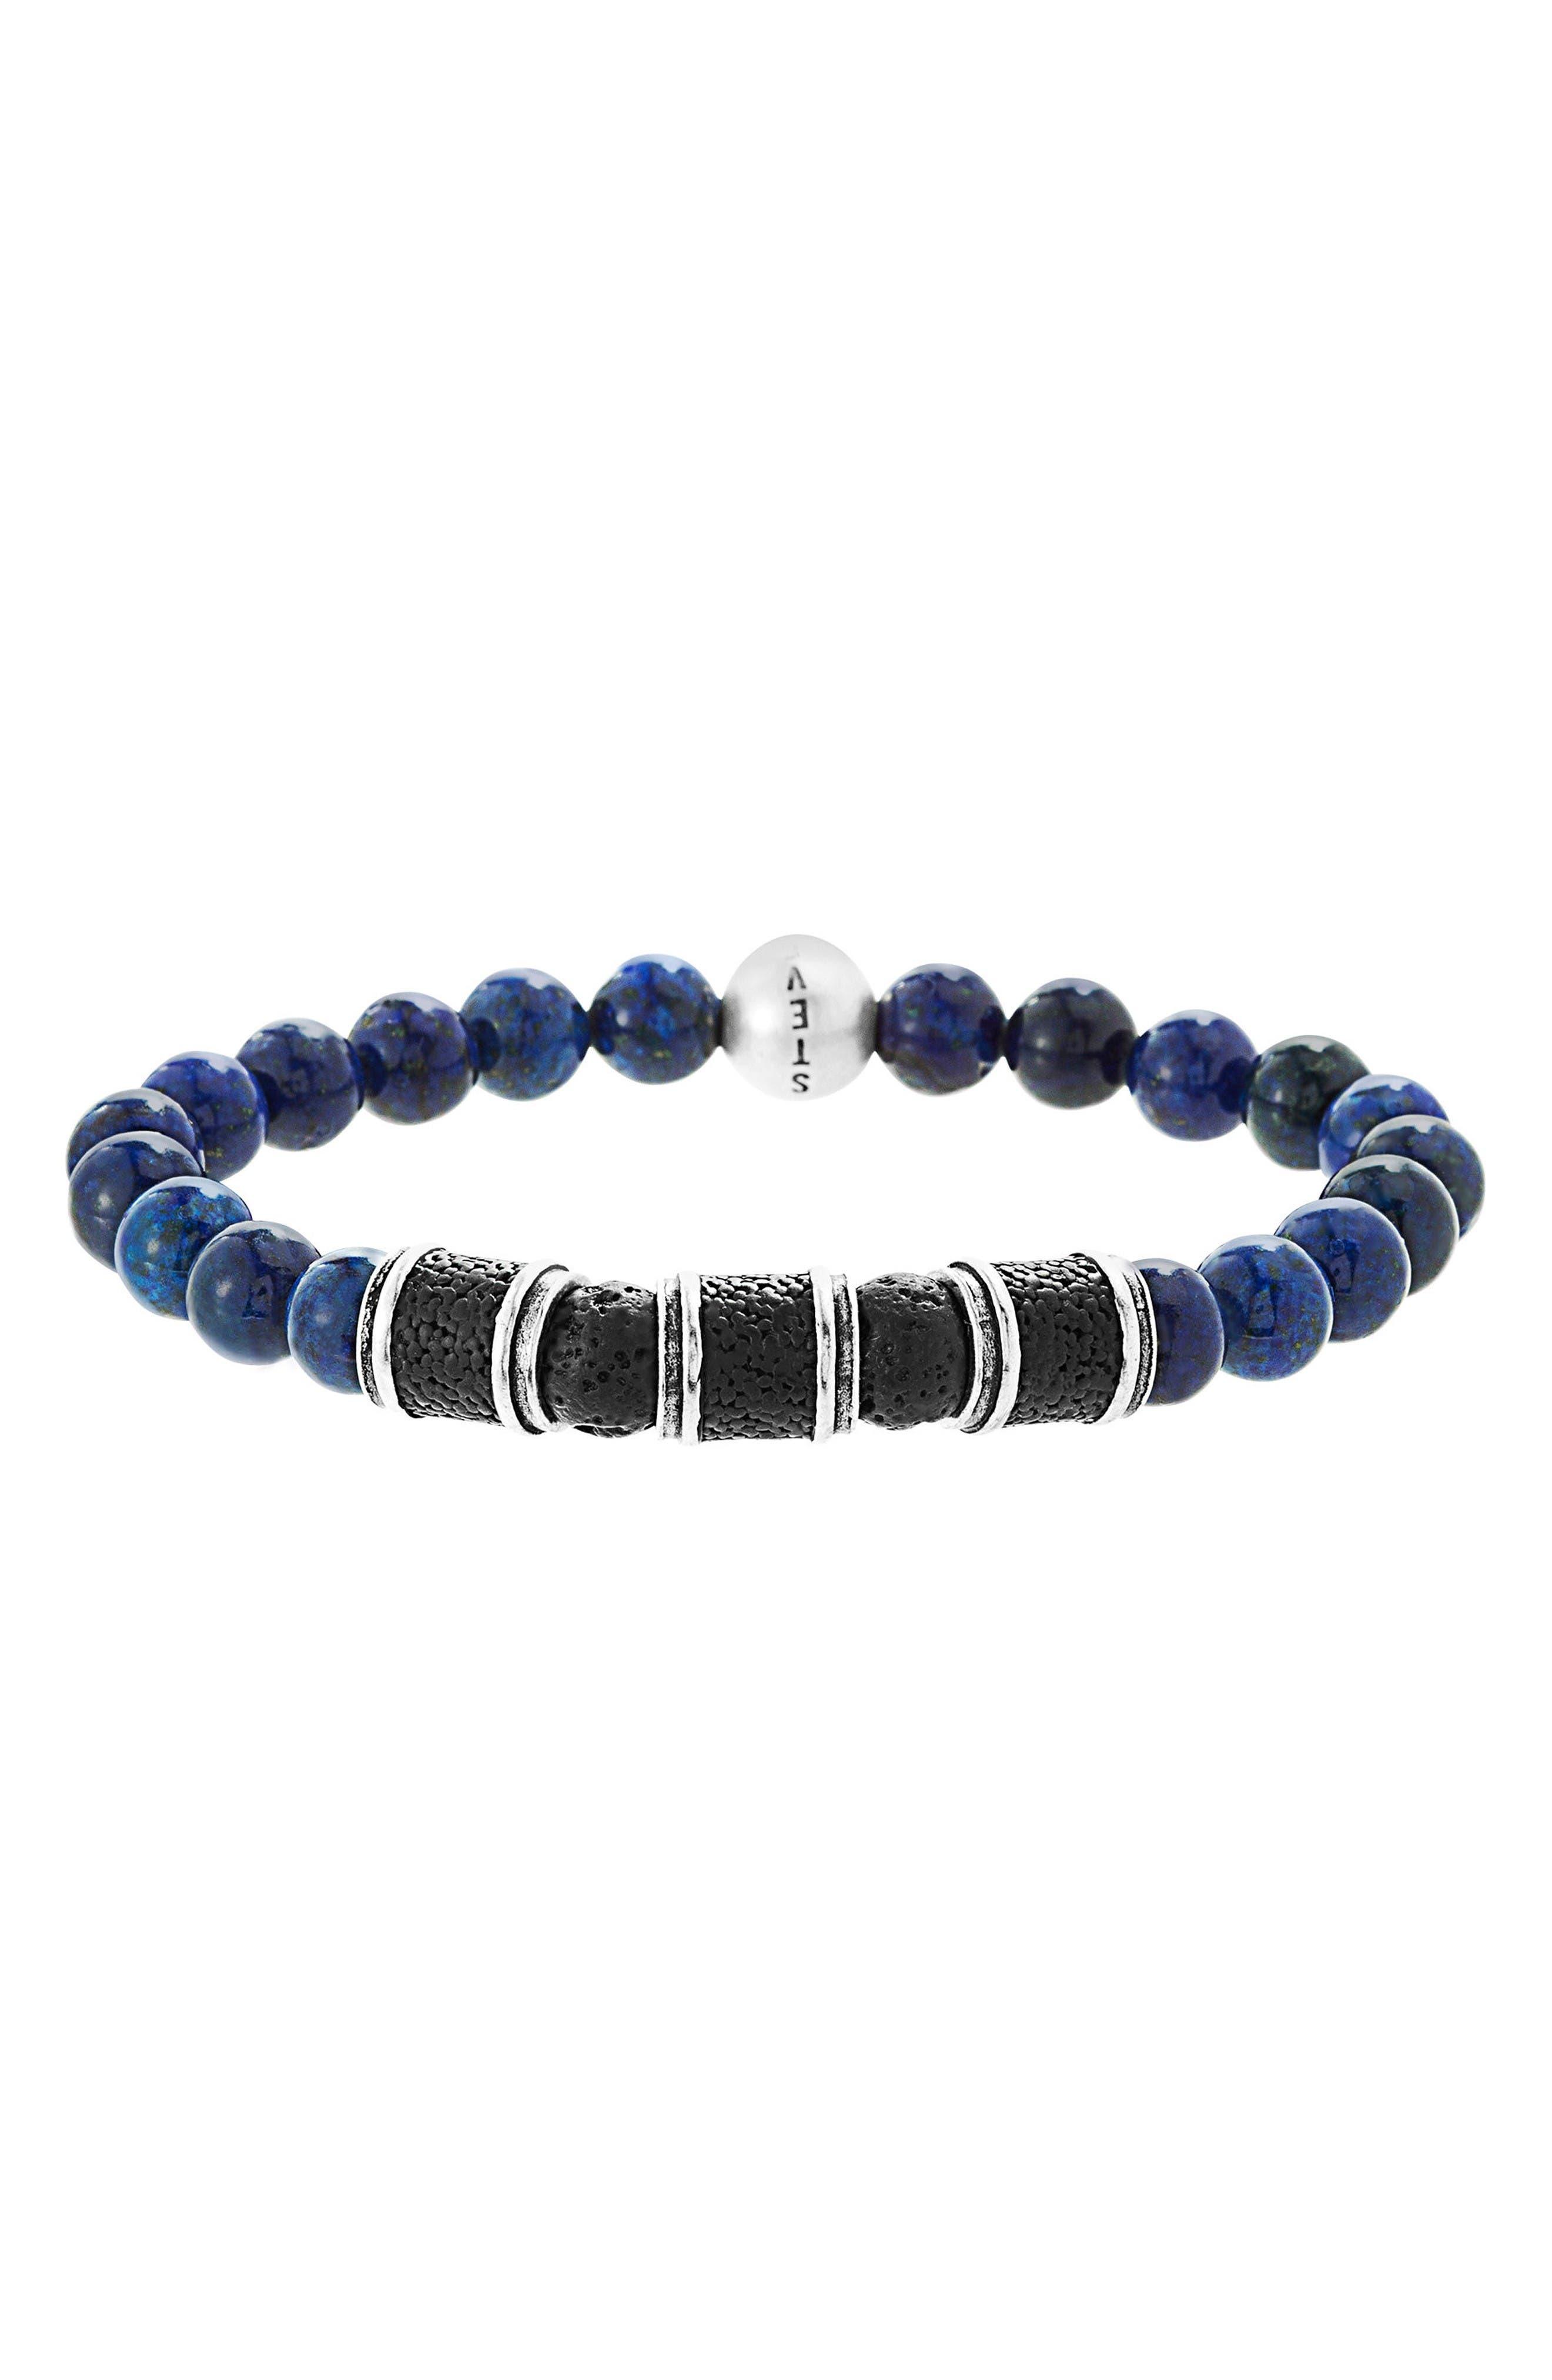 Lapis Lazuli Bead Bracelet,                             Main thumbnail 1, color,                             Lapis